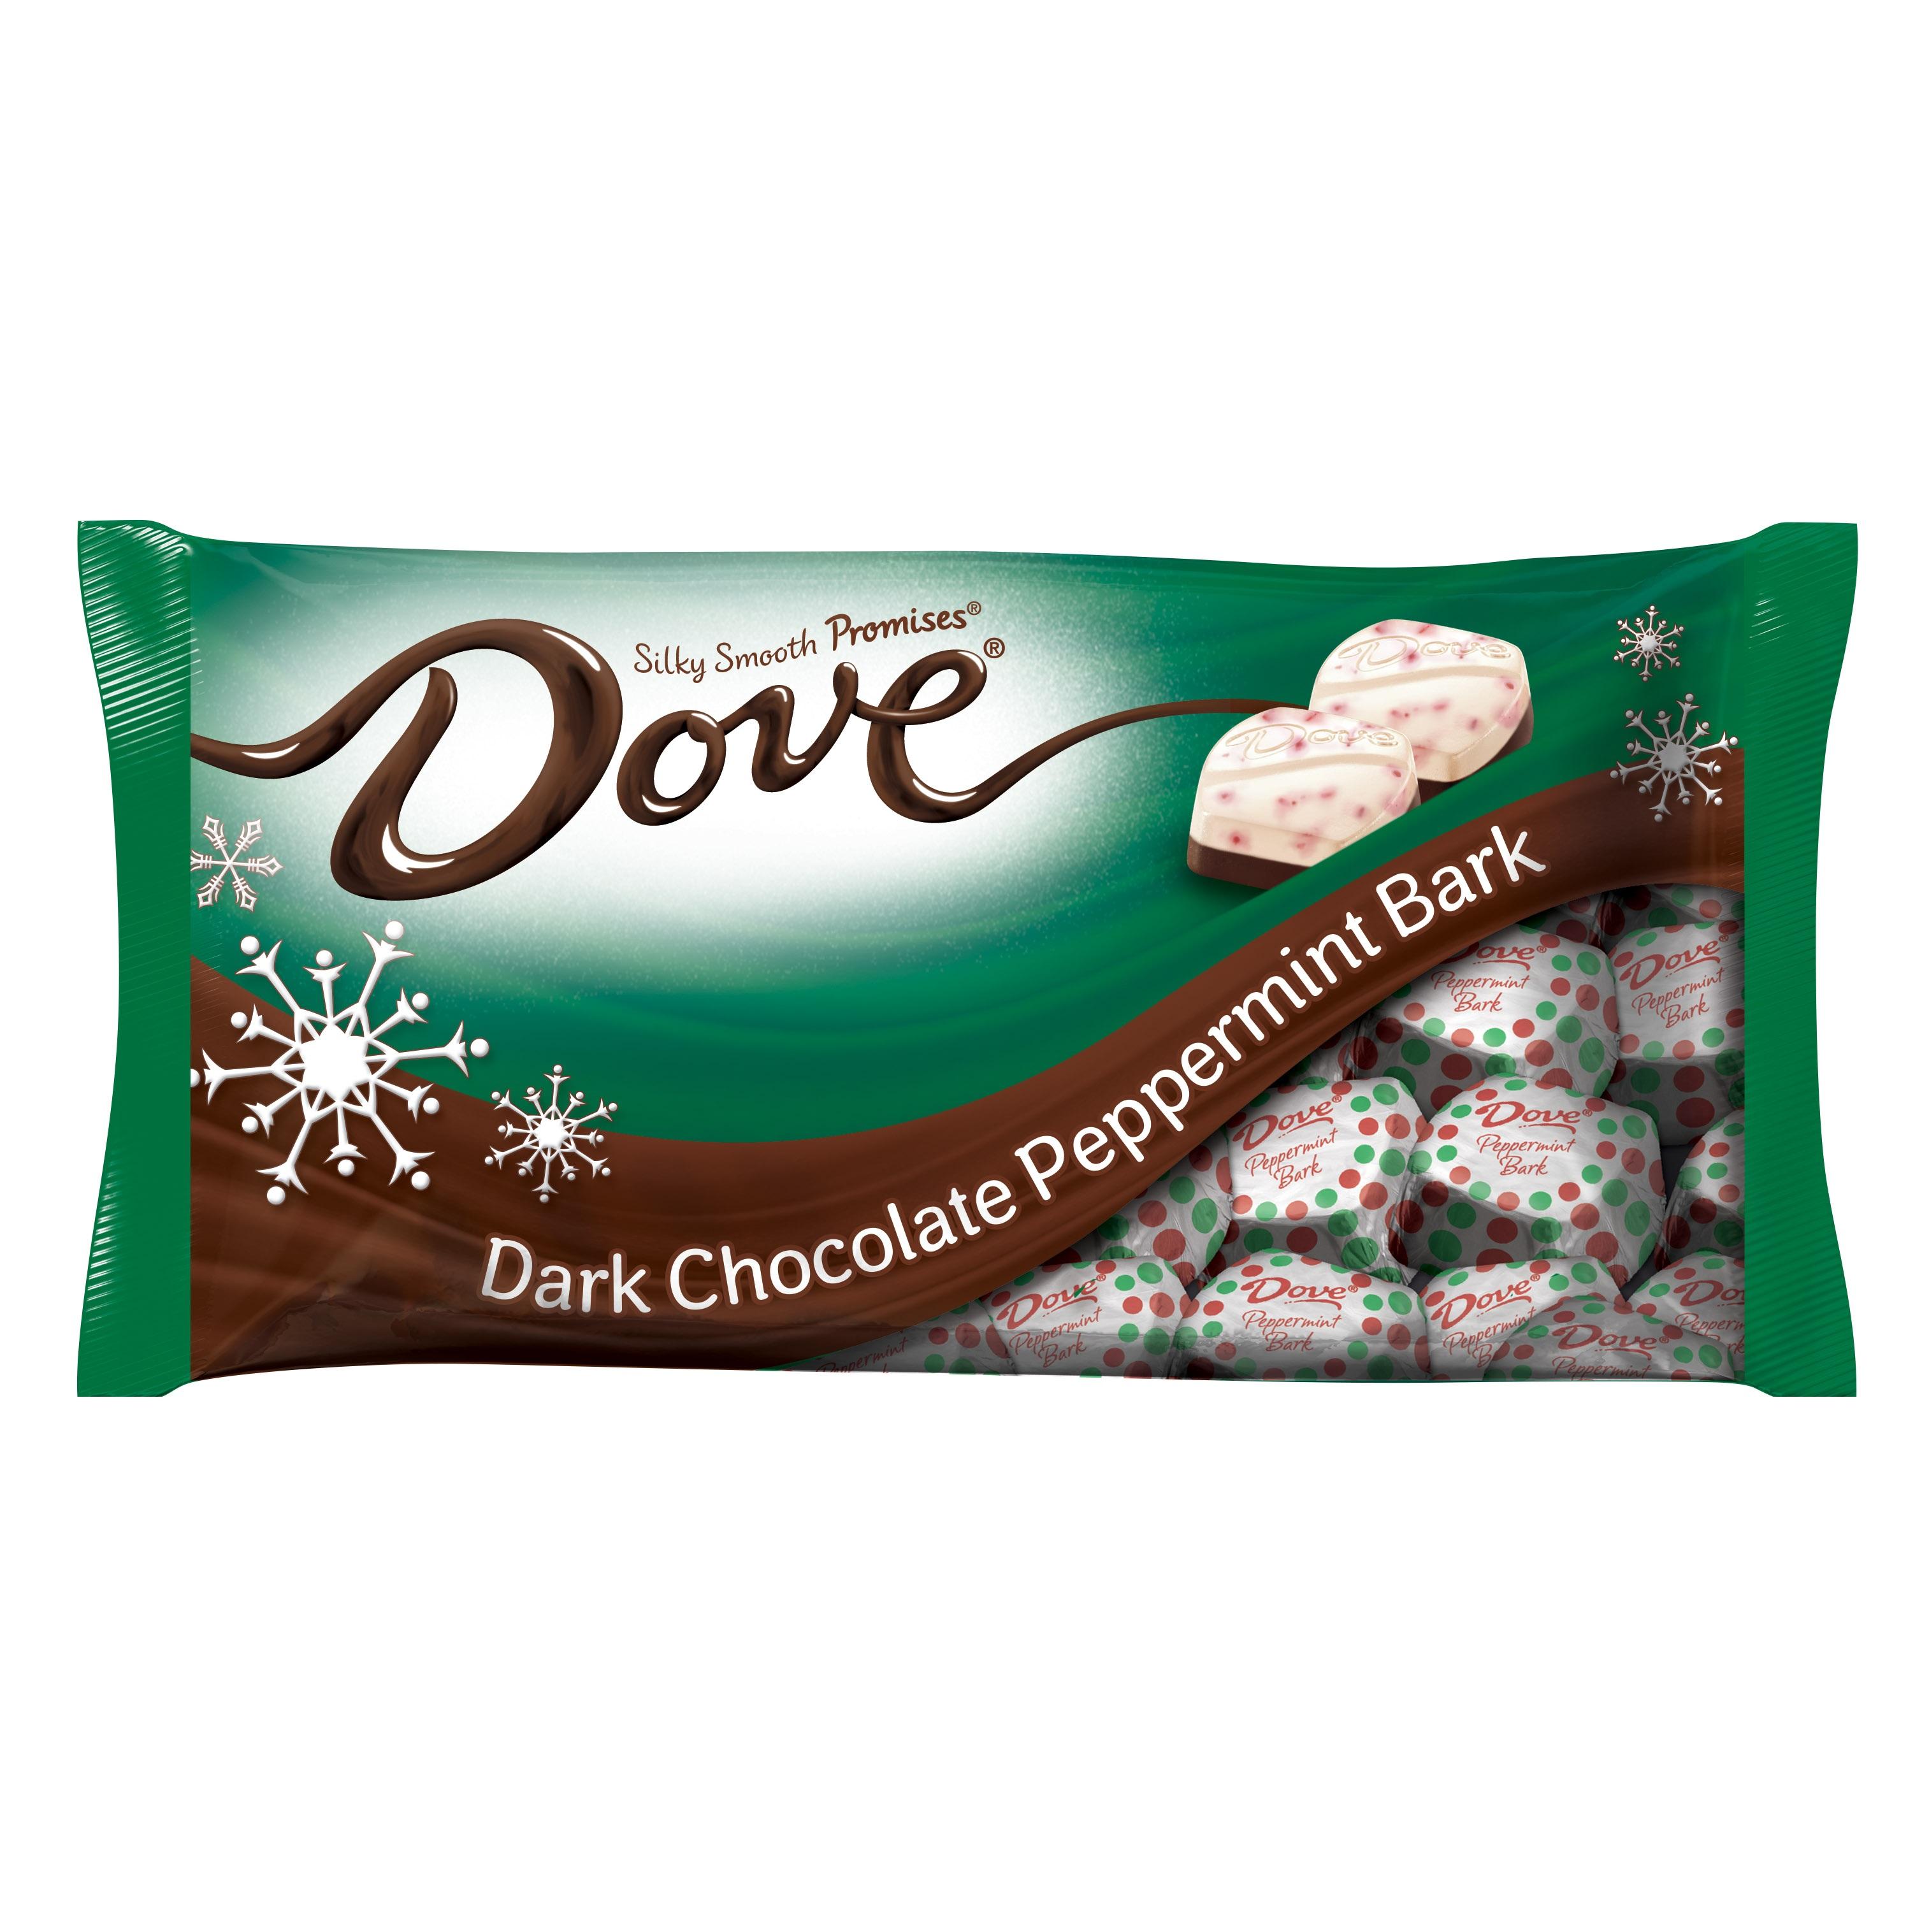 Pieces Of Dark Chocolate Calories